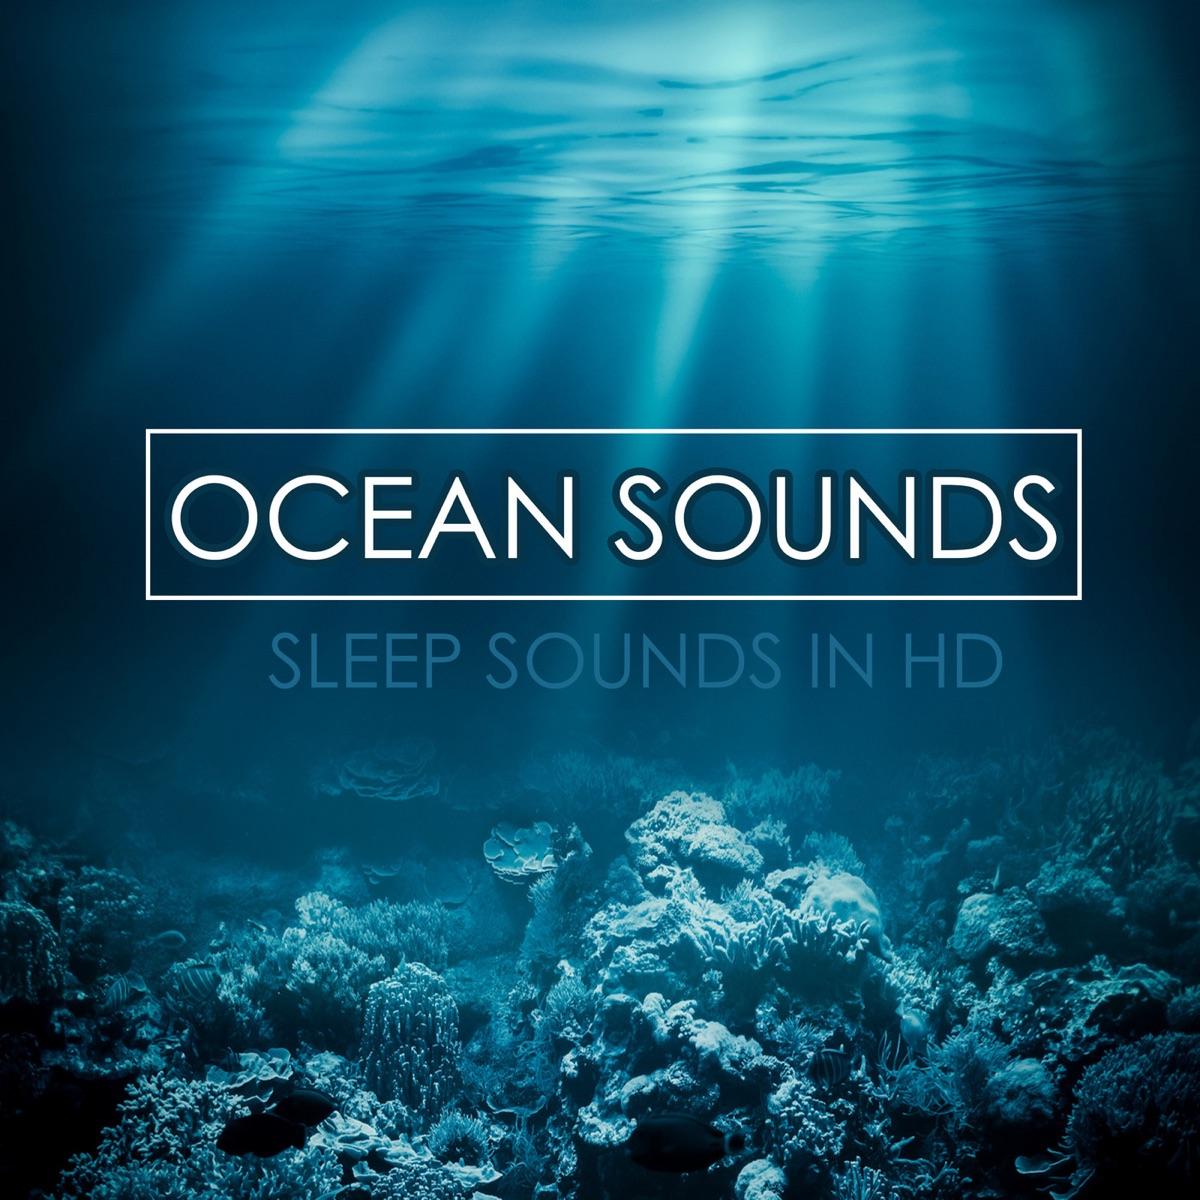 Ocean Sounds Album Cover by Deep Sleep & Nature Sounds